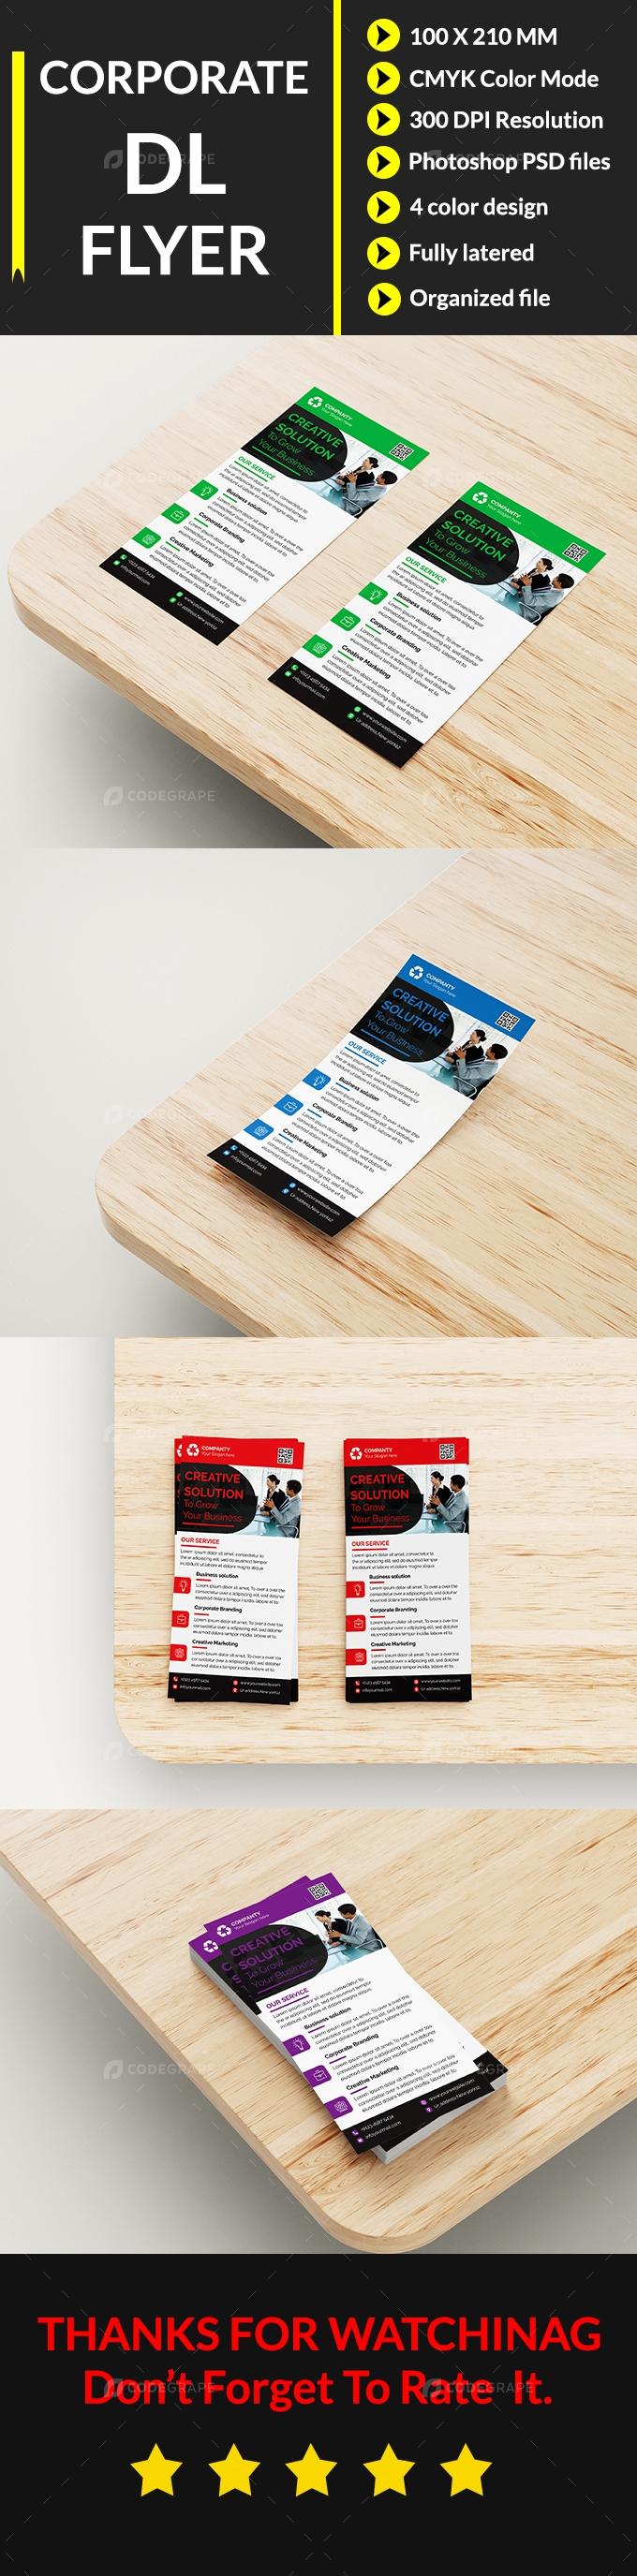 Corporate DL Flyer Design